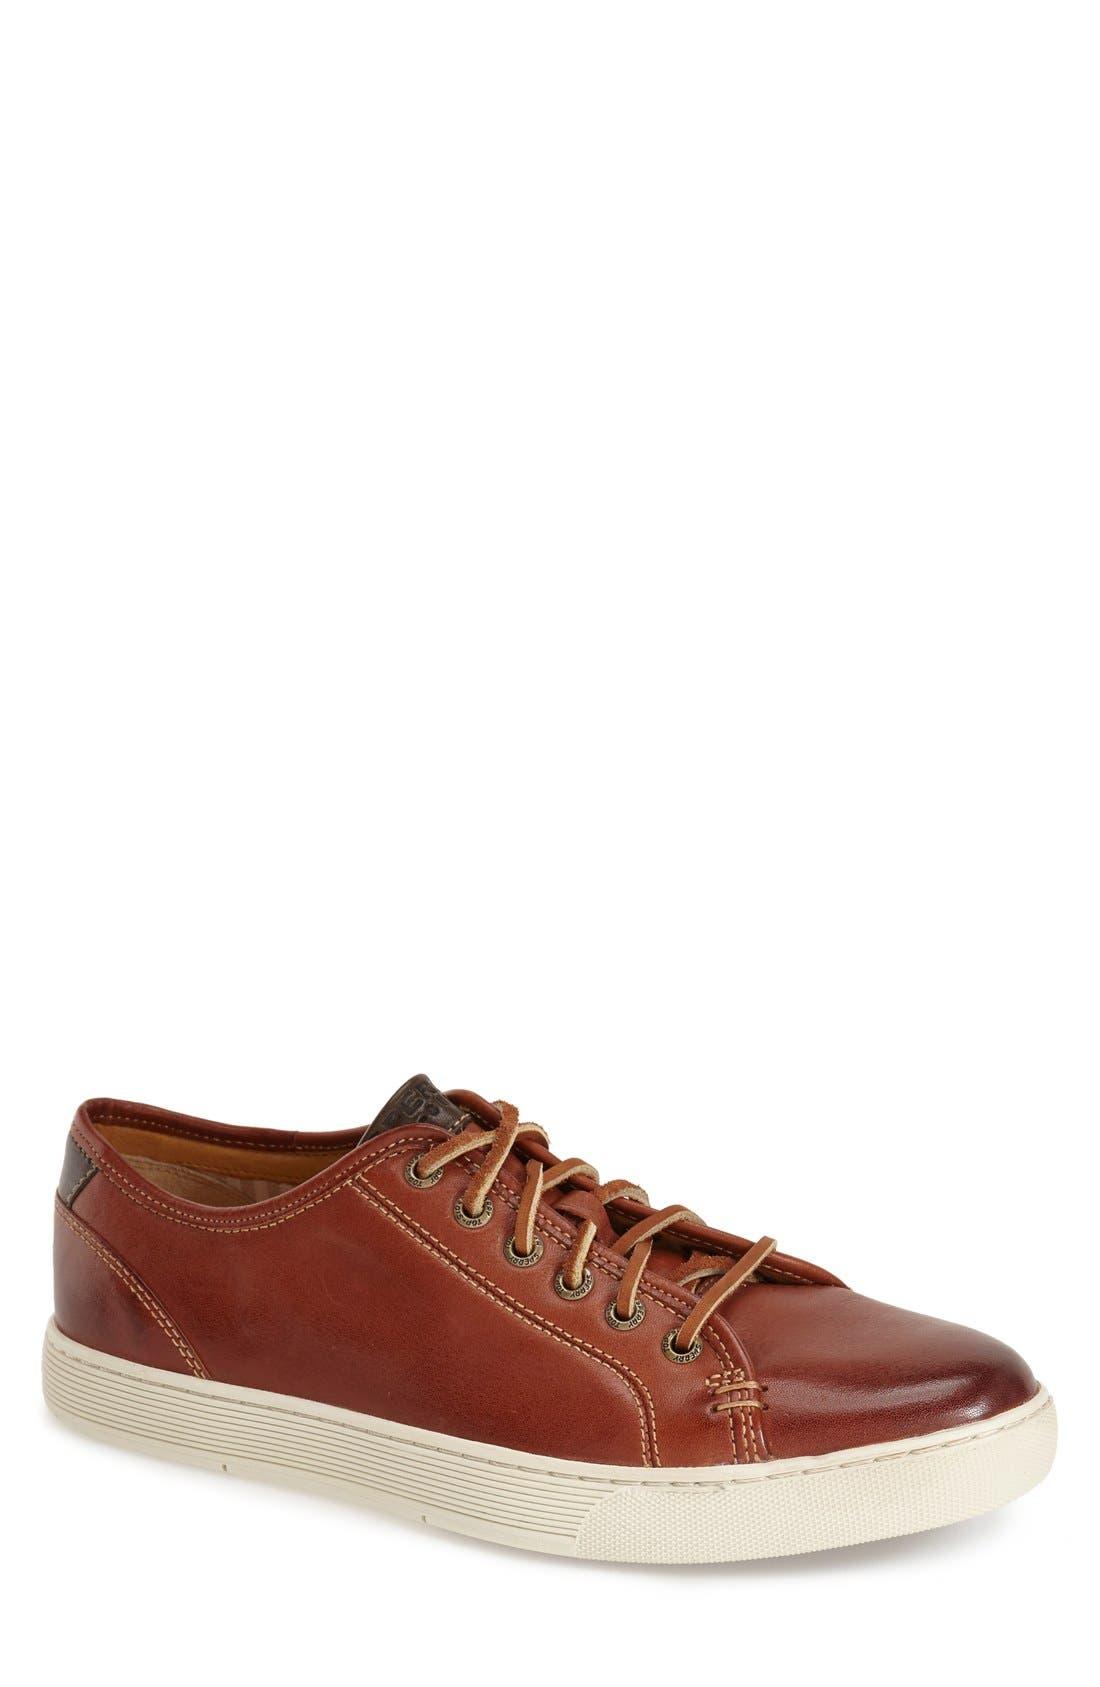 Alternate Image 1 Selected - Sperry 'Gold Cup - LTT' Sneaker (Men)'